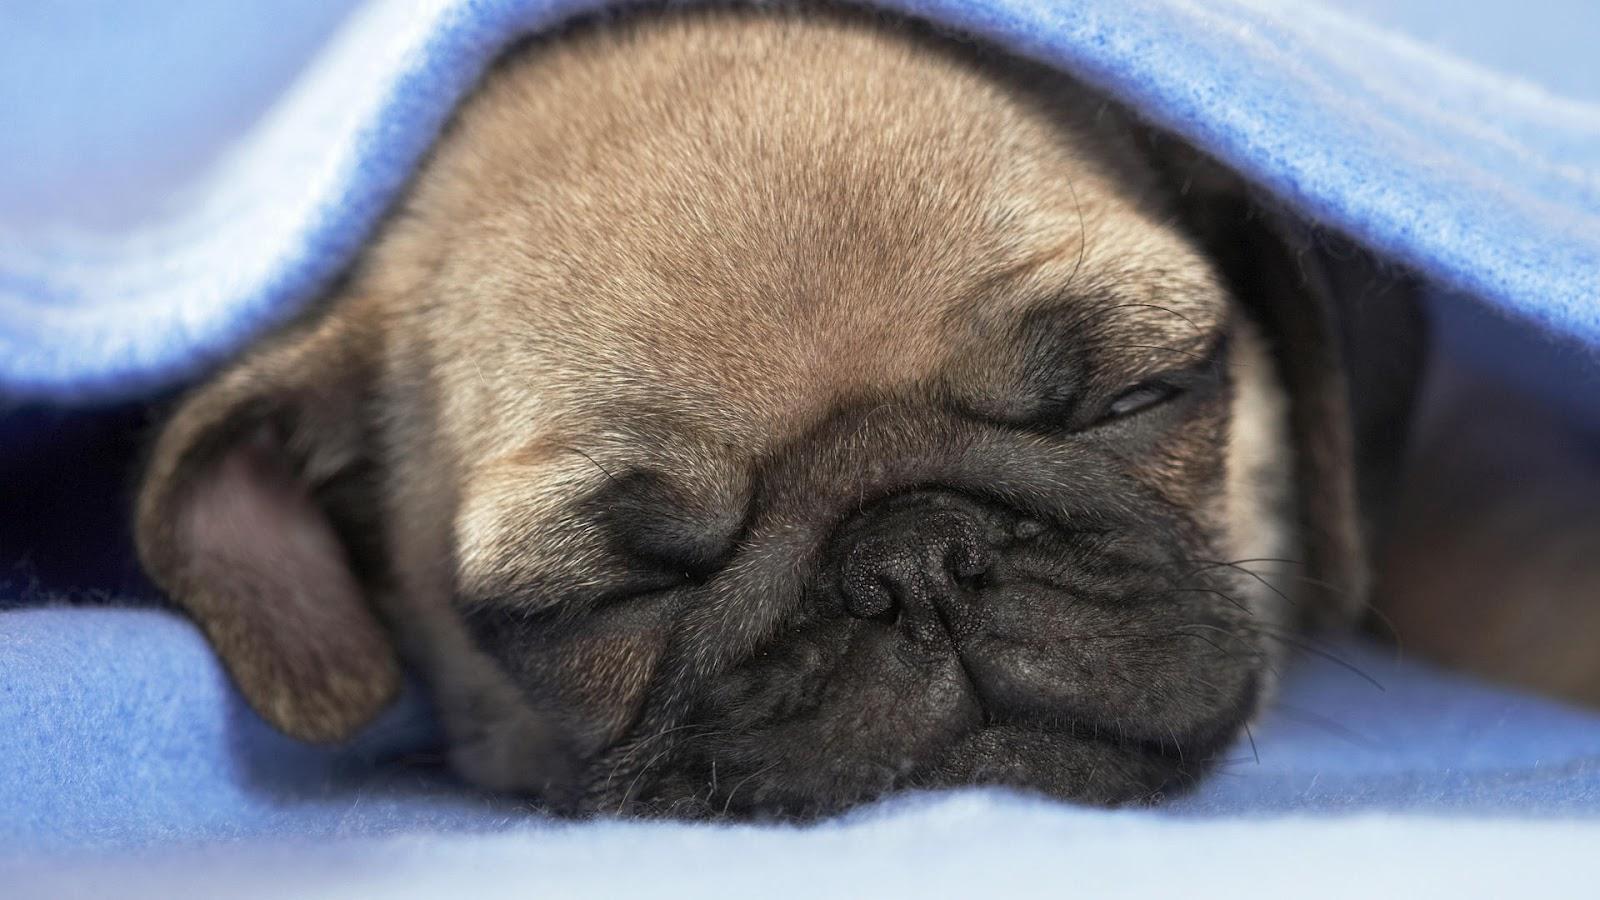 cute puppies sleeping wallpaper - photo #25